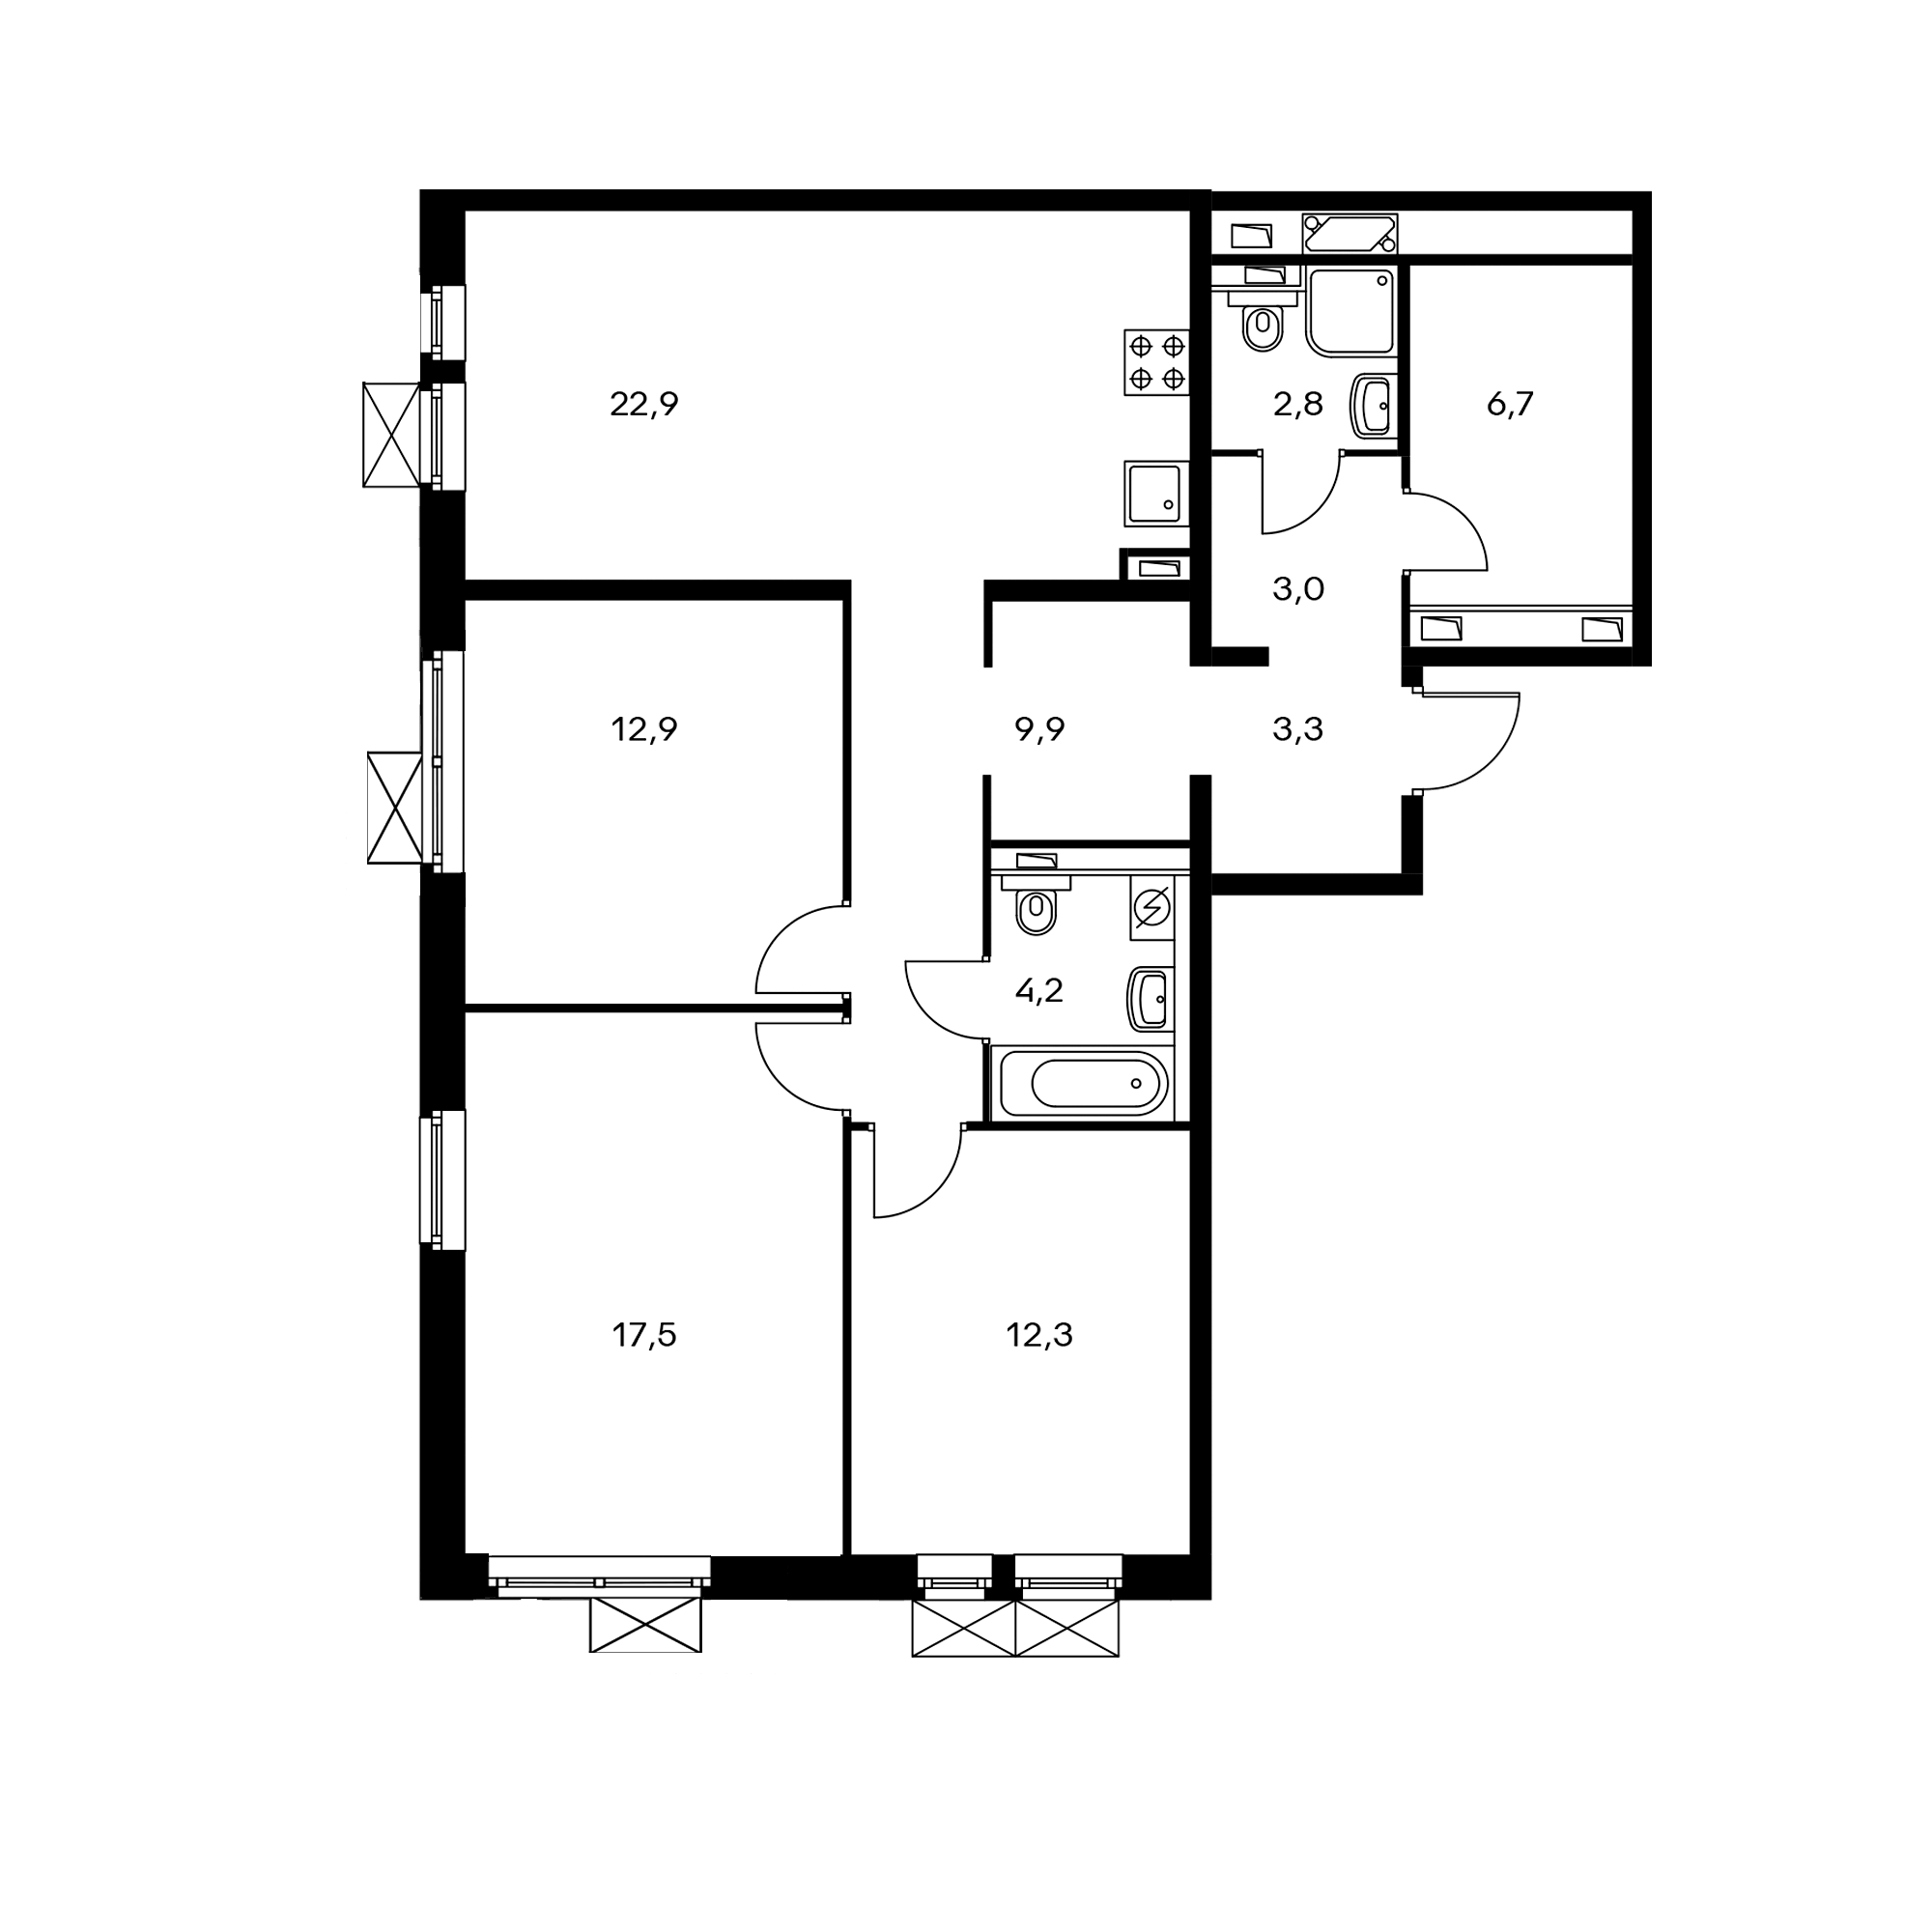 3EL23_10.8-1_2